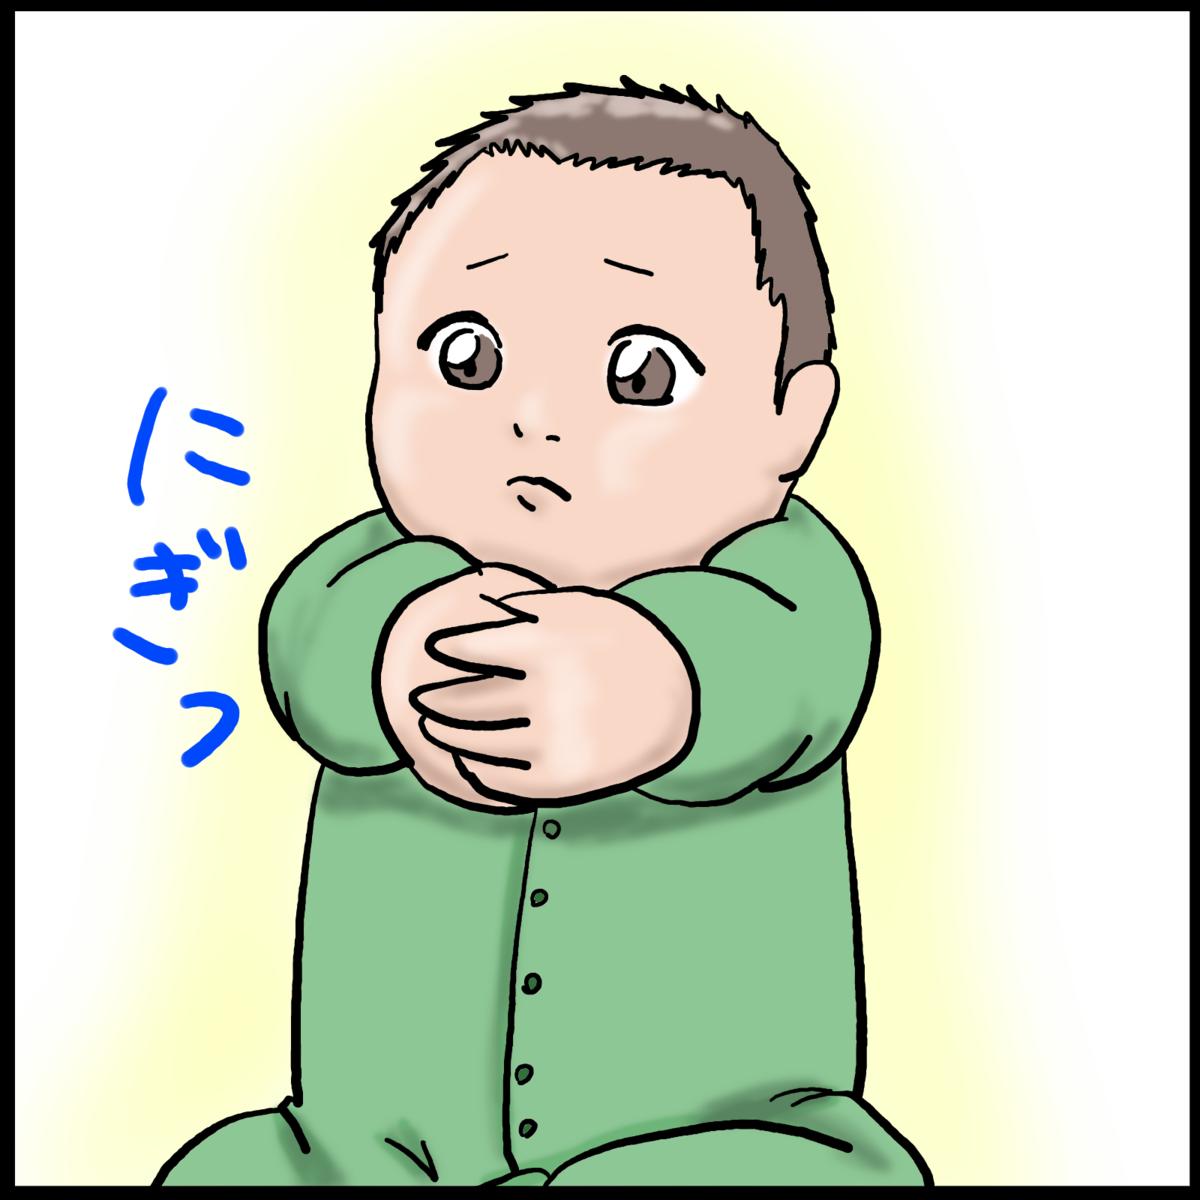 f:id:suzysuzyhiyopippi:20201101004043p:plain